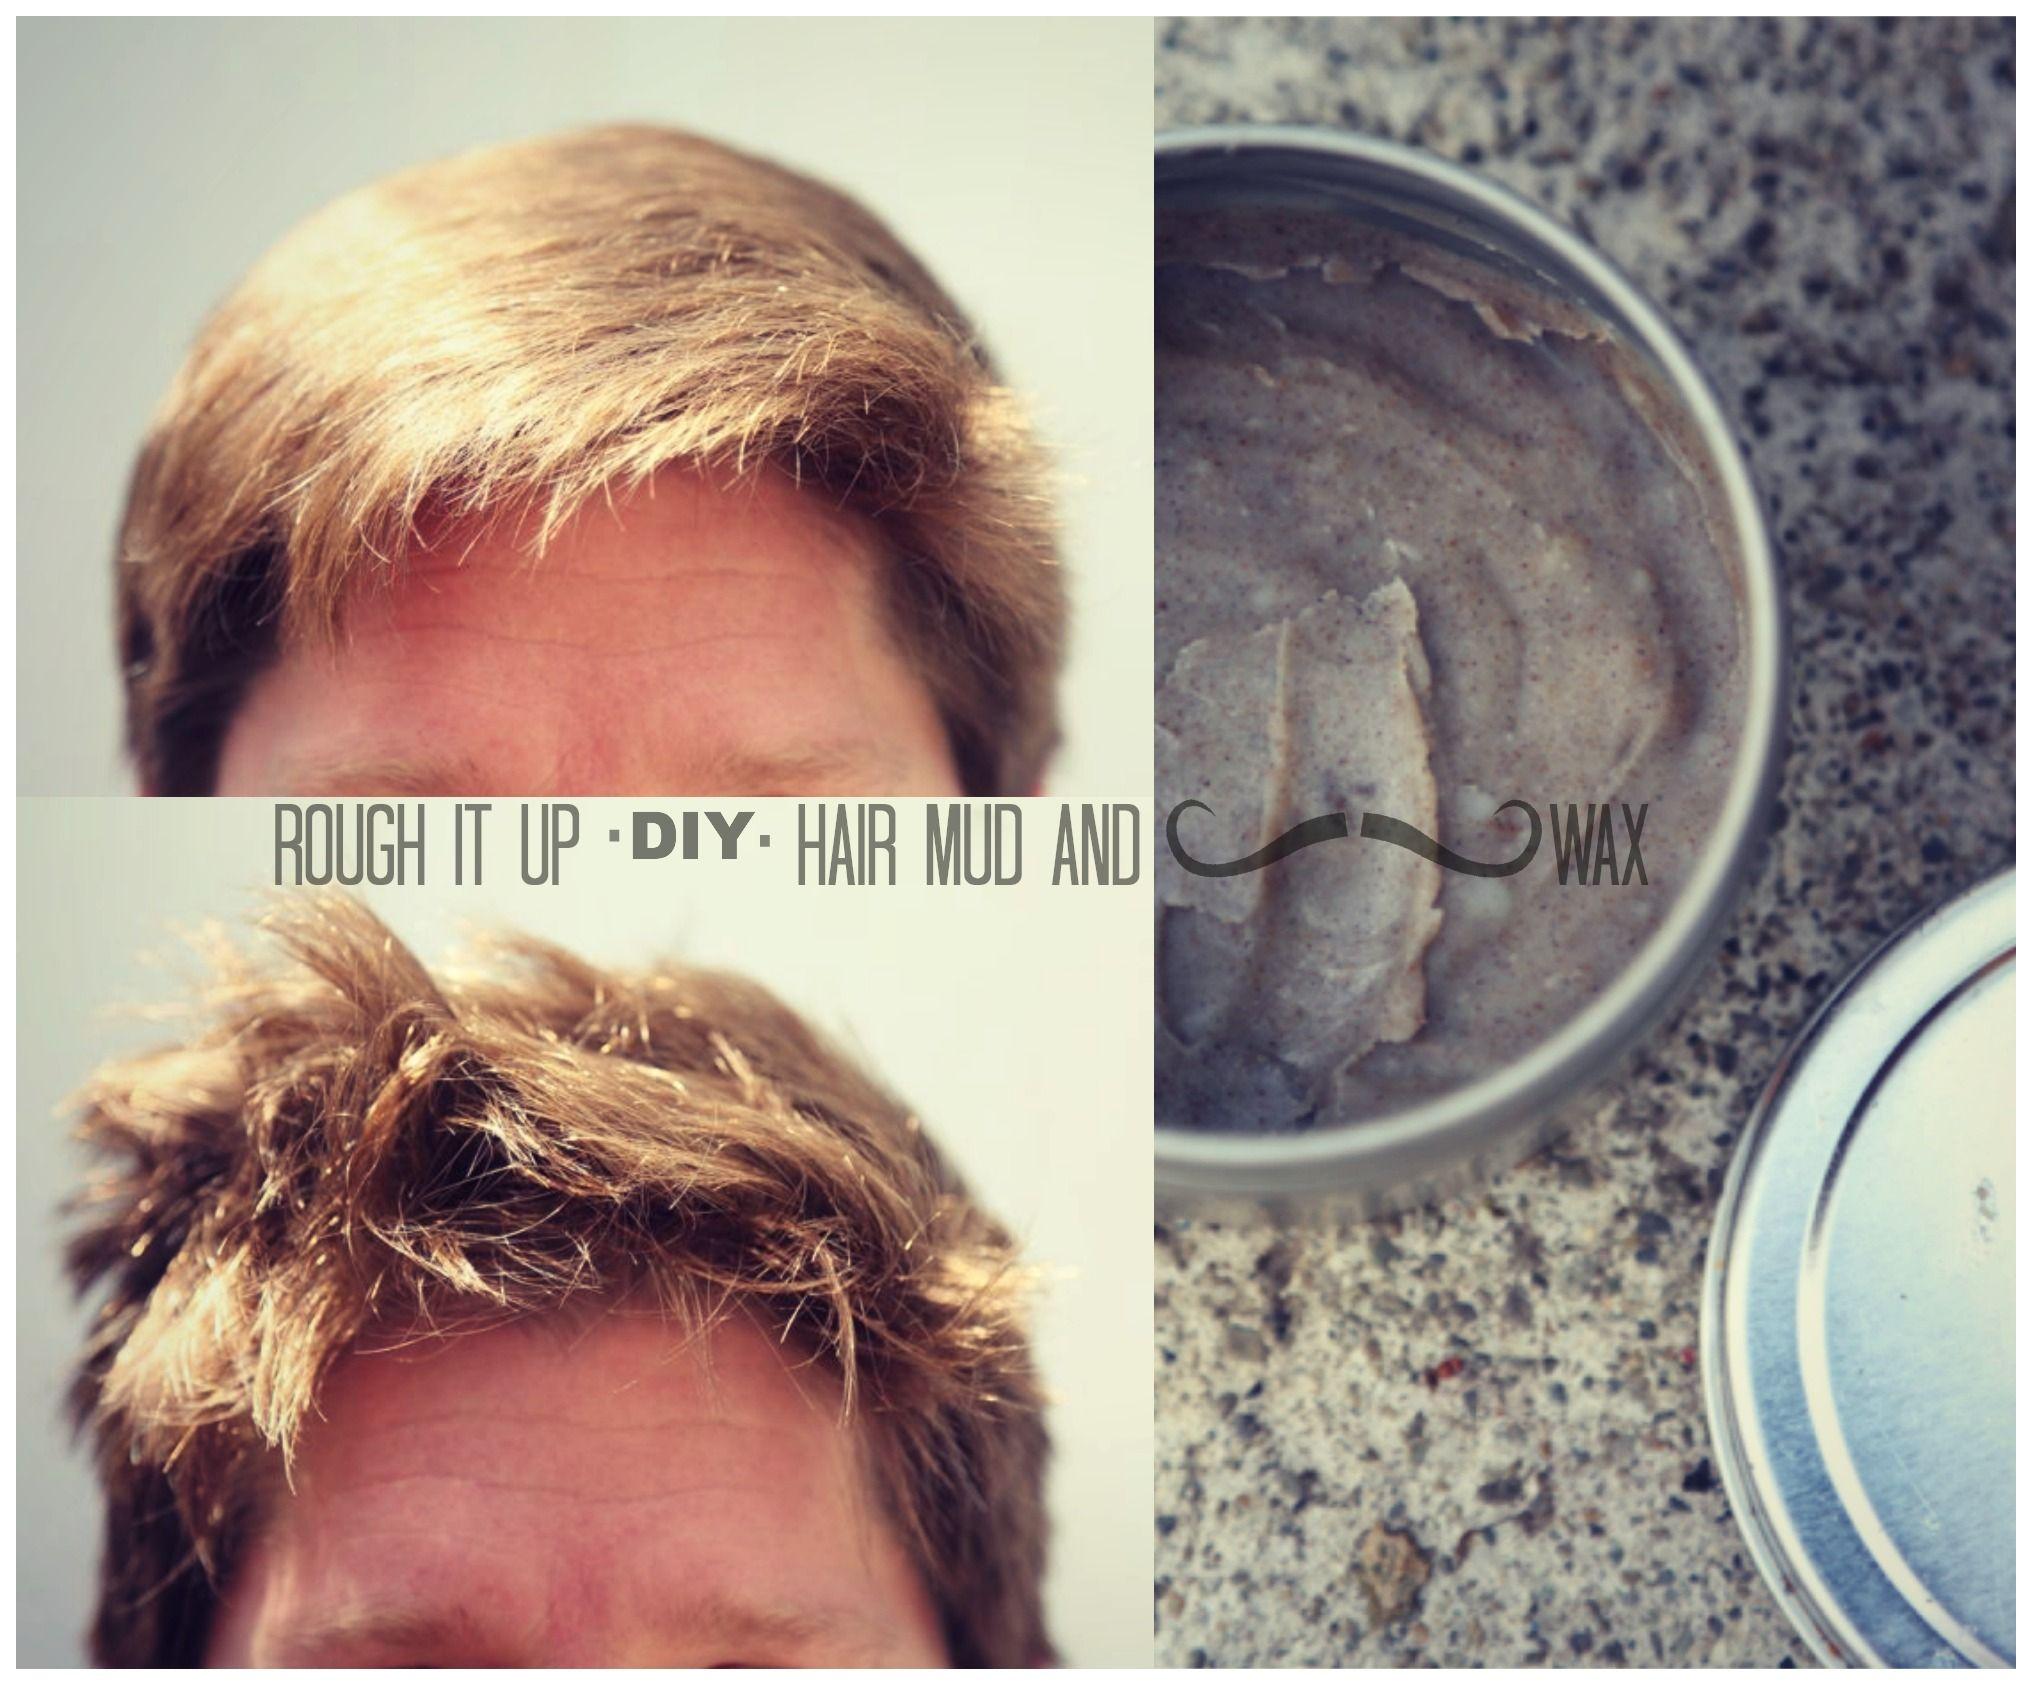 Roxiejanehunt Rough It Up Hair Mud For Fine Hair And Max Texture Diy Hair Pomade Diy Hair Wax Diy Hair Paste